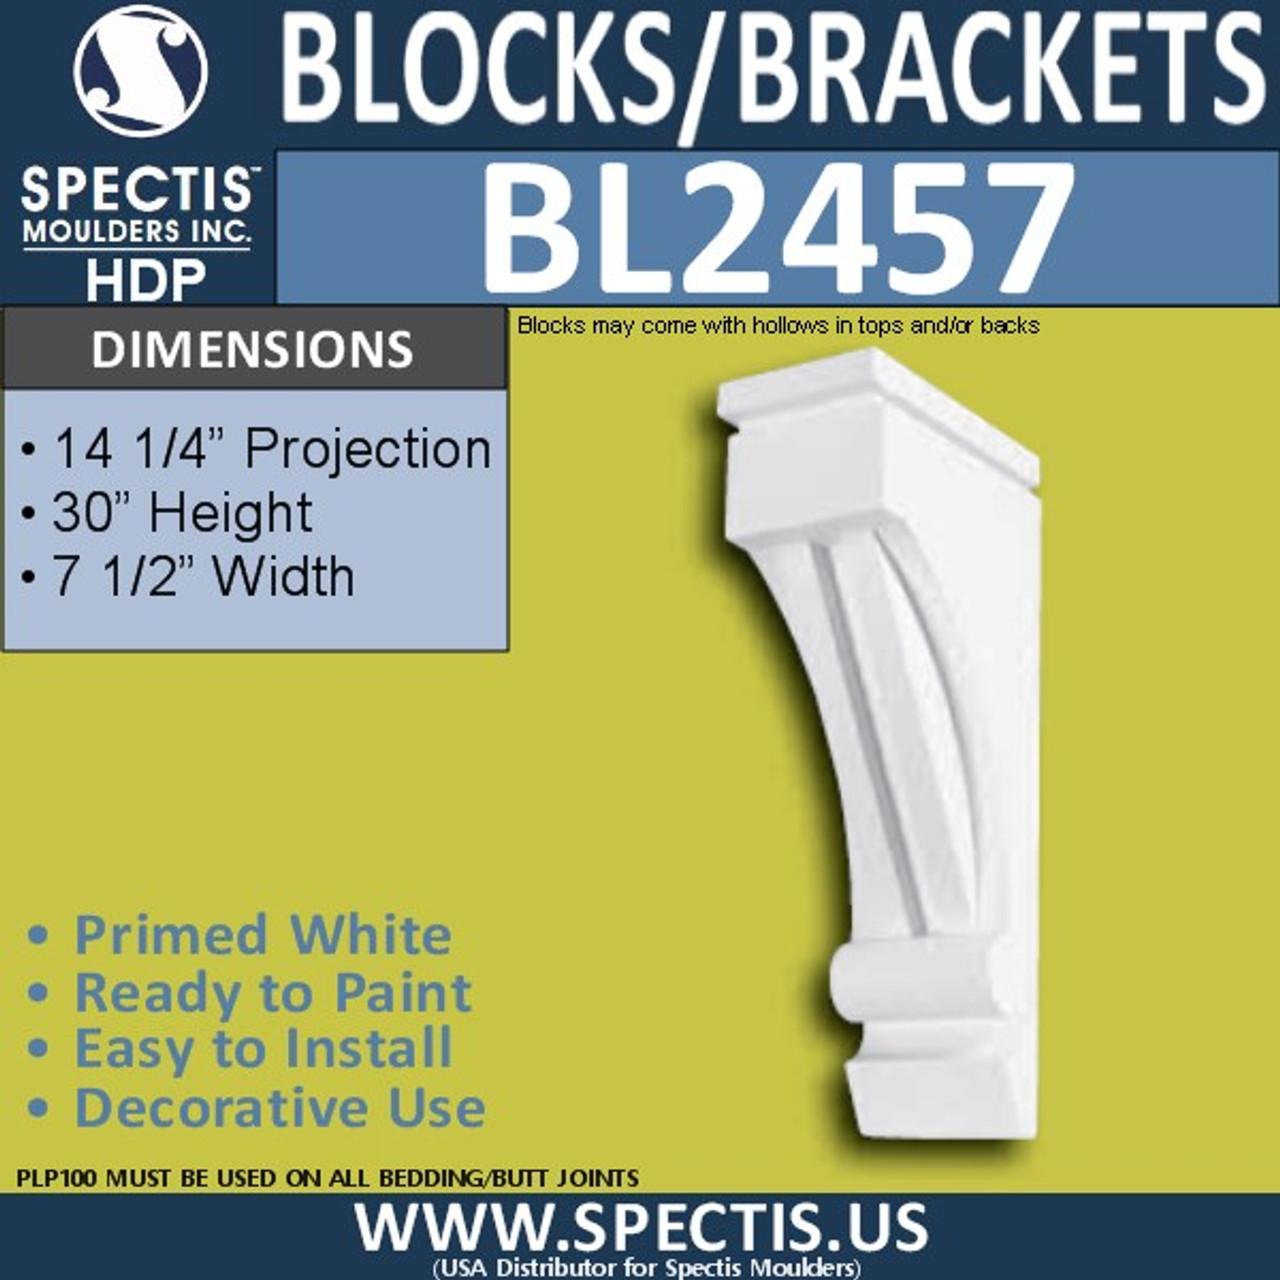 "BL2457 Eave Block or Bracket 7.5""W x 30""H x 14.5"" P"